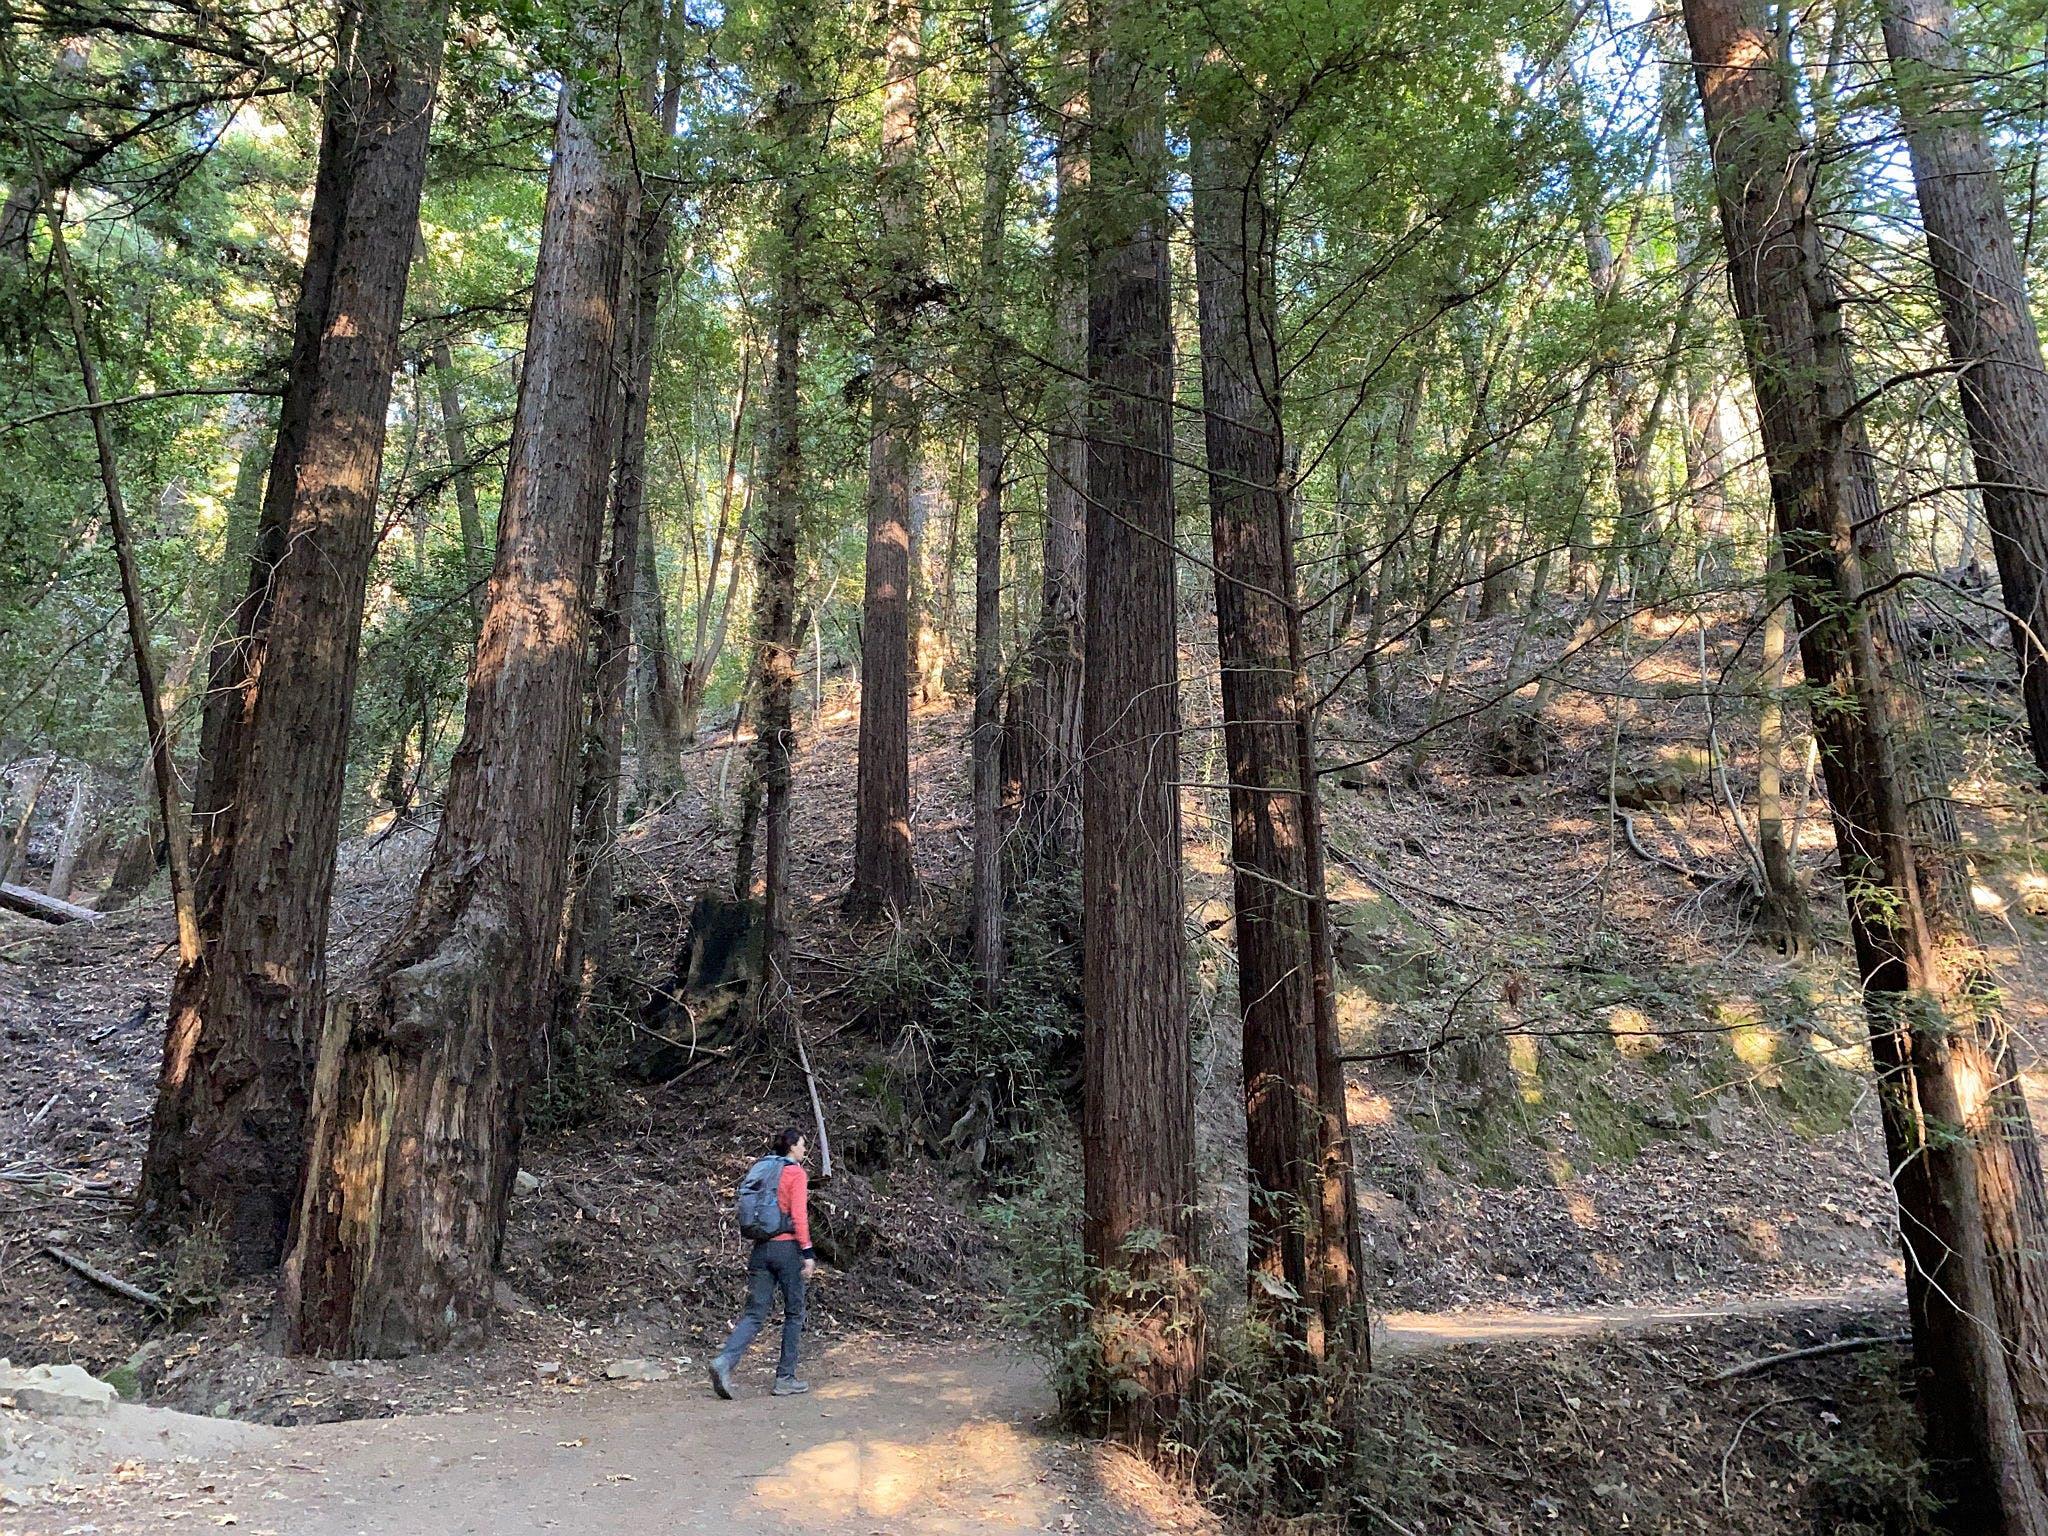 Todd Creek Redwoods Hike at Sanborn County Park